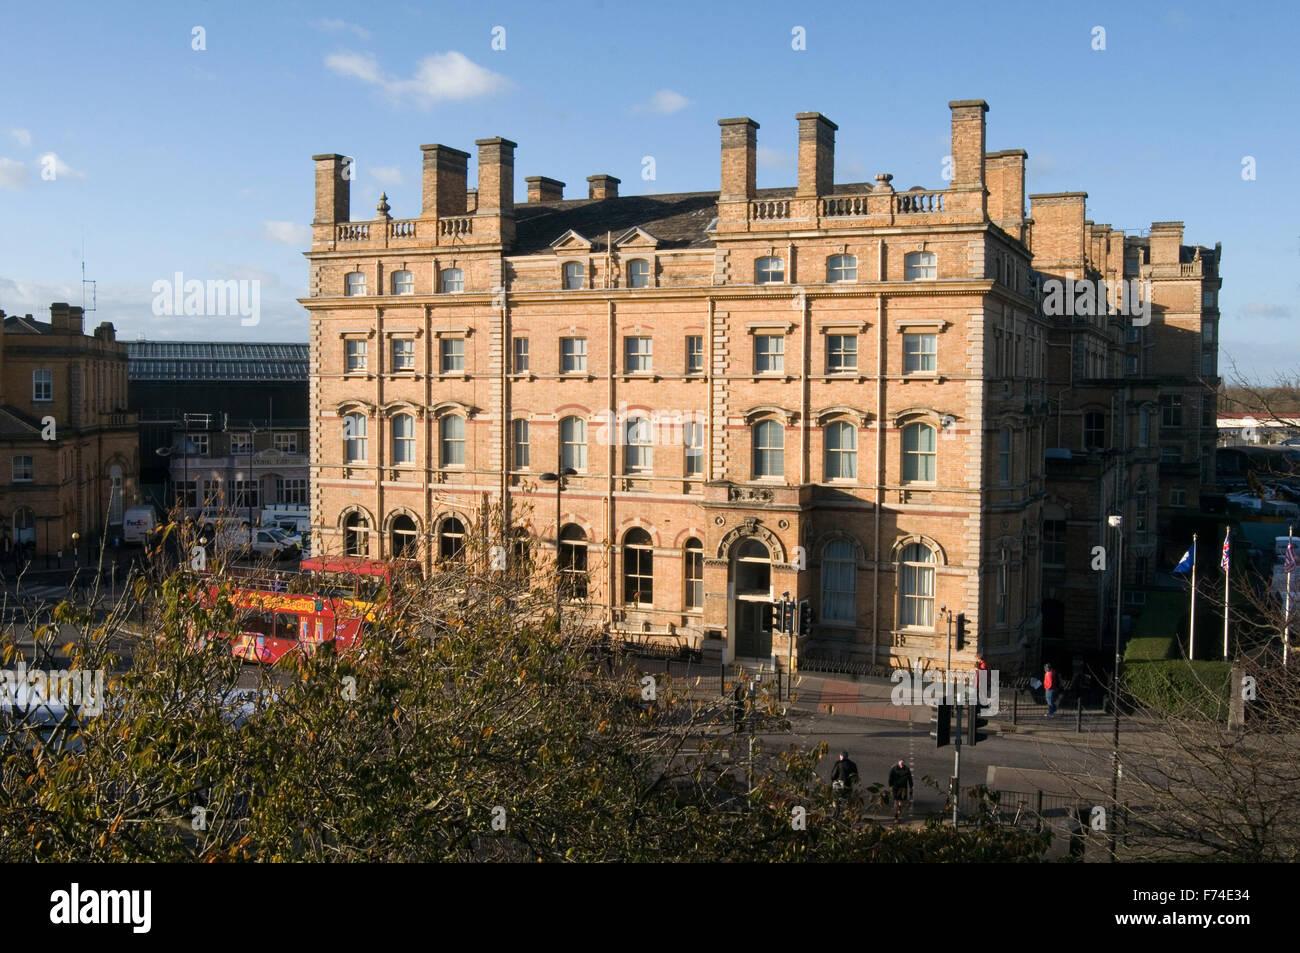 royal york hotel uk in york  Grade II listed building adjacent to York railway train station opened on 22 February - Stock Image